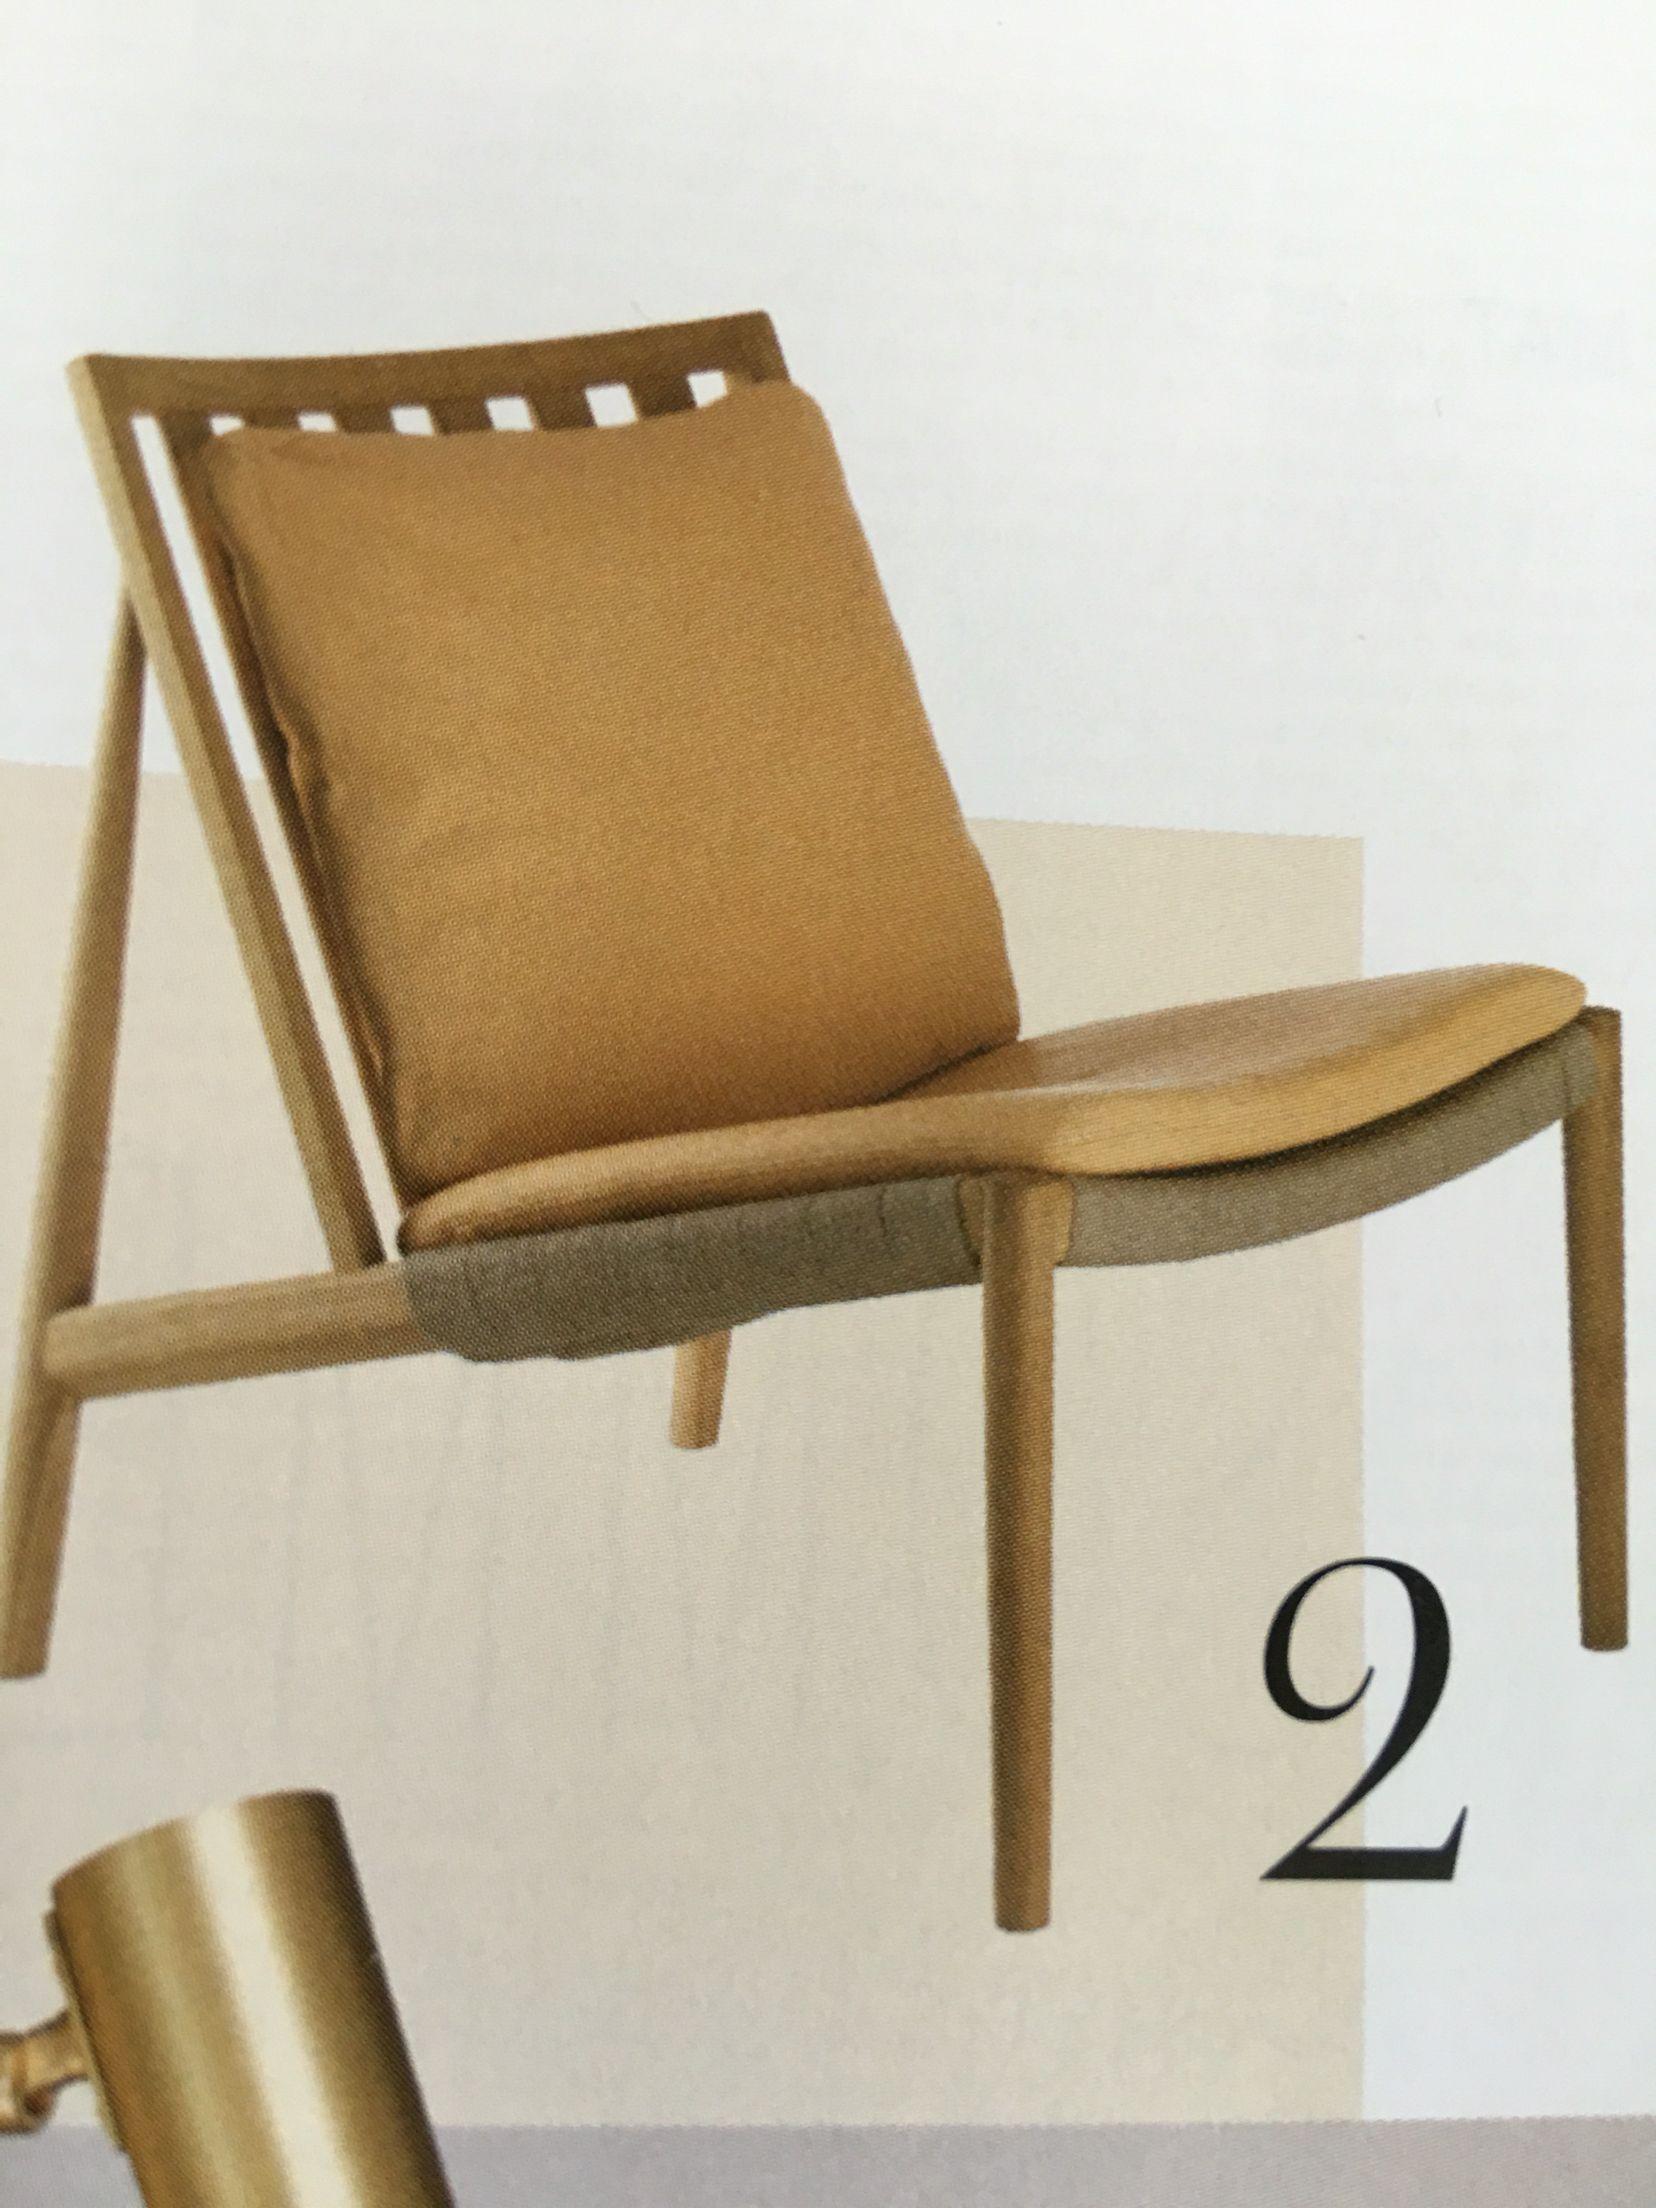 Easy chair, 12.500, Norrgavel